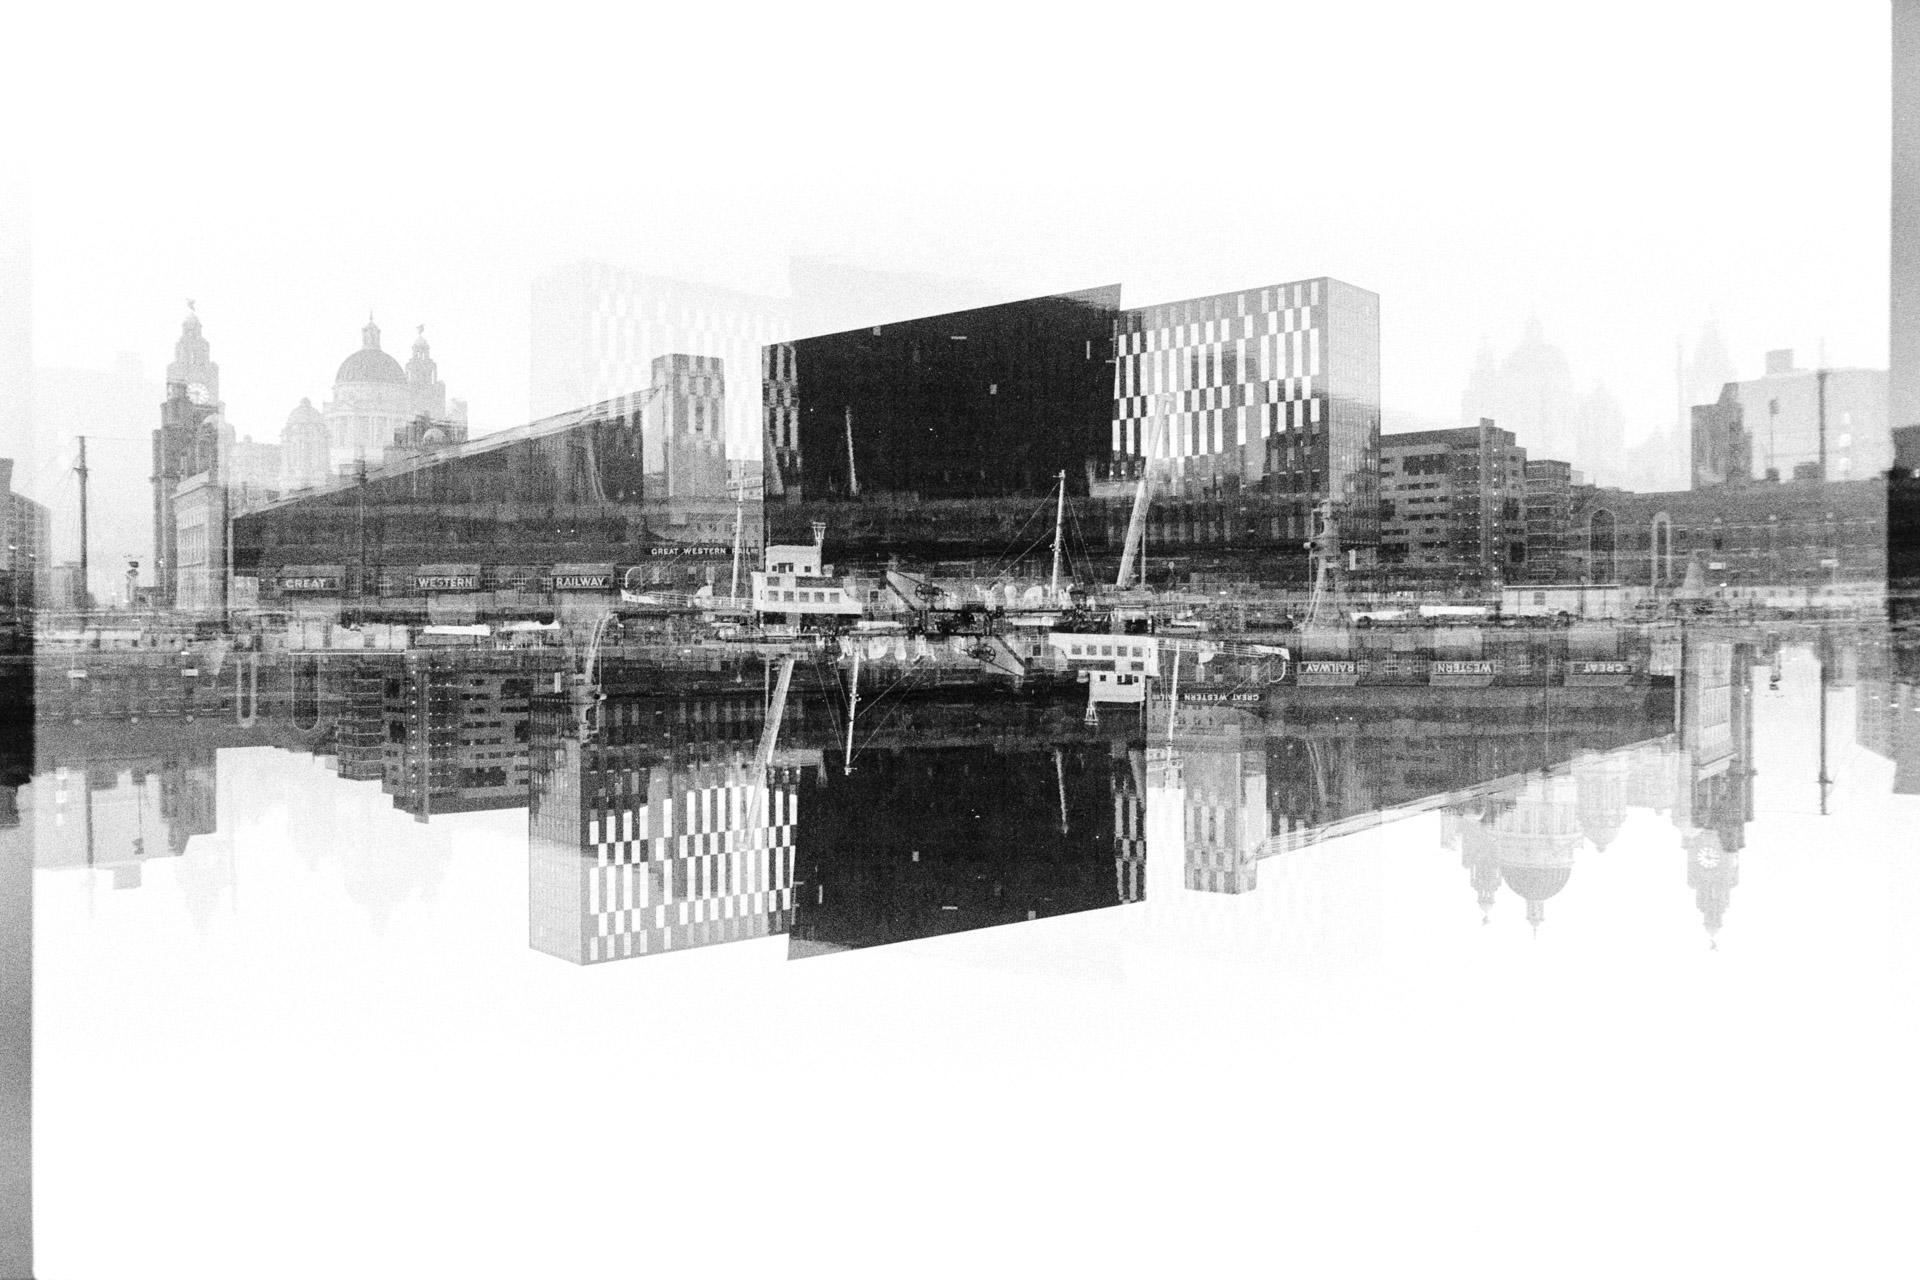 Liverpool 2013 (1) Waterfront.jpg